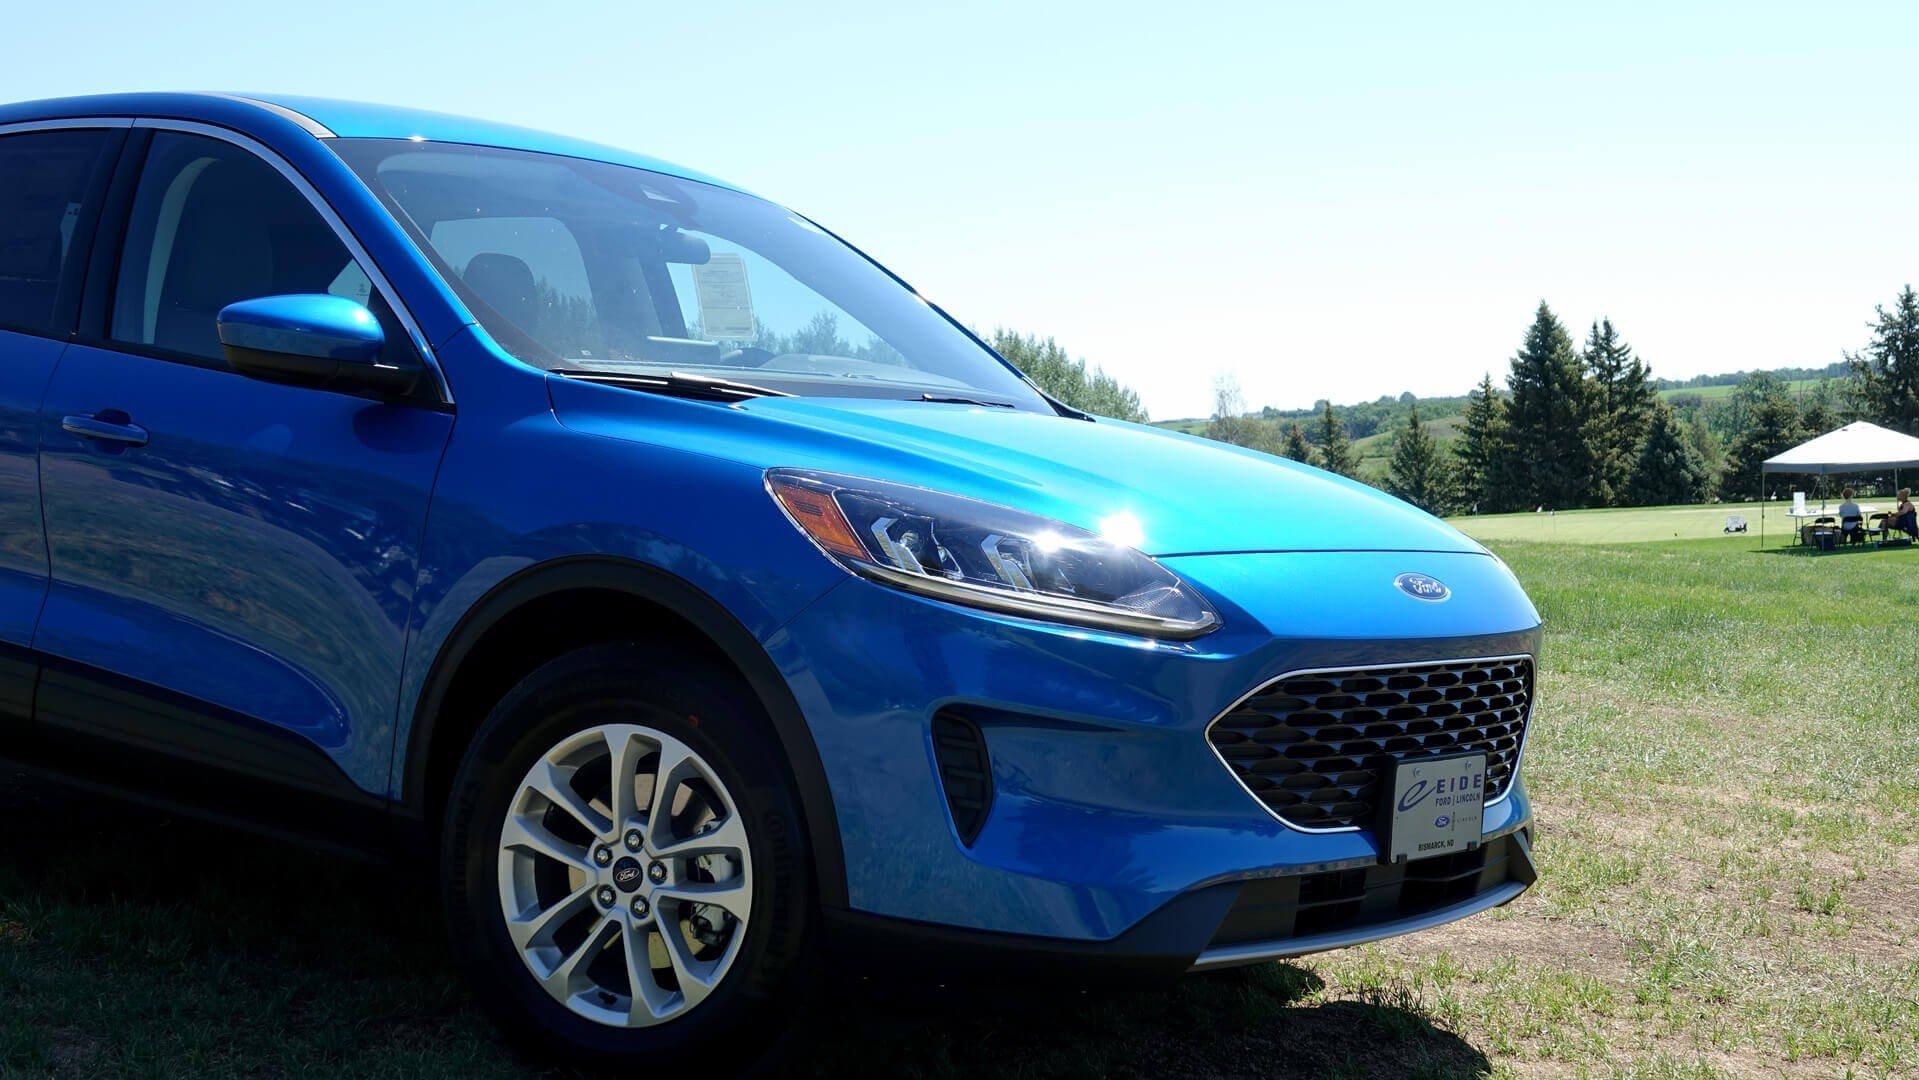 2021 Golf Scramble Prize: A new Ford